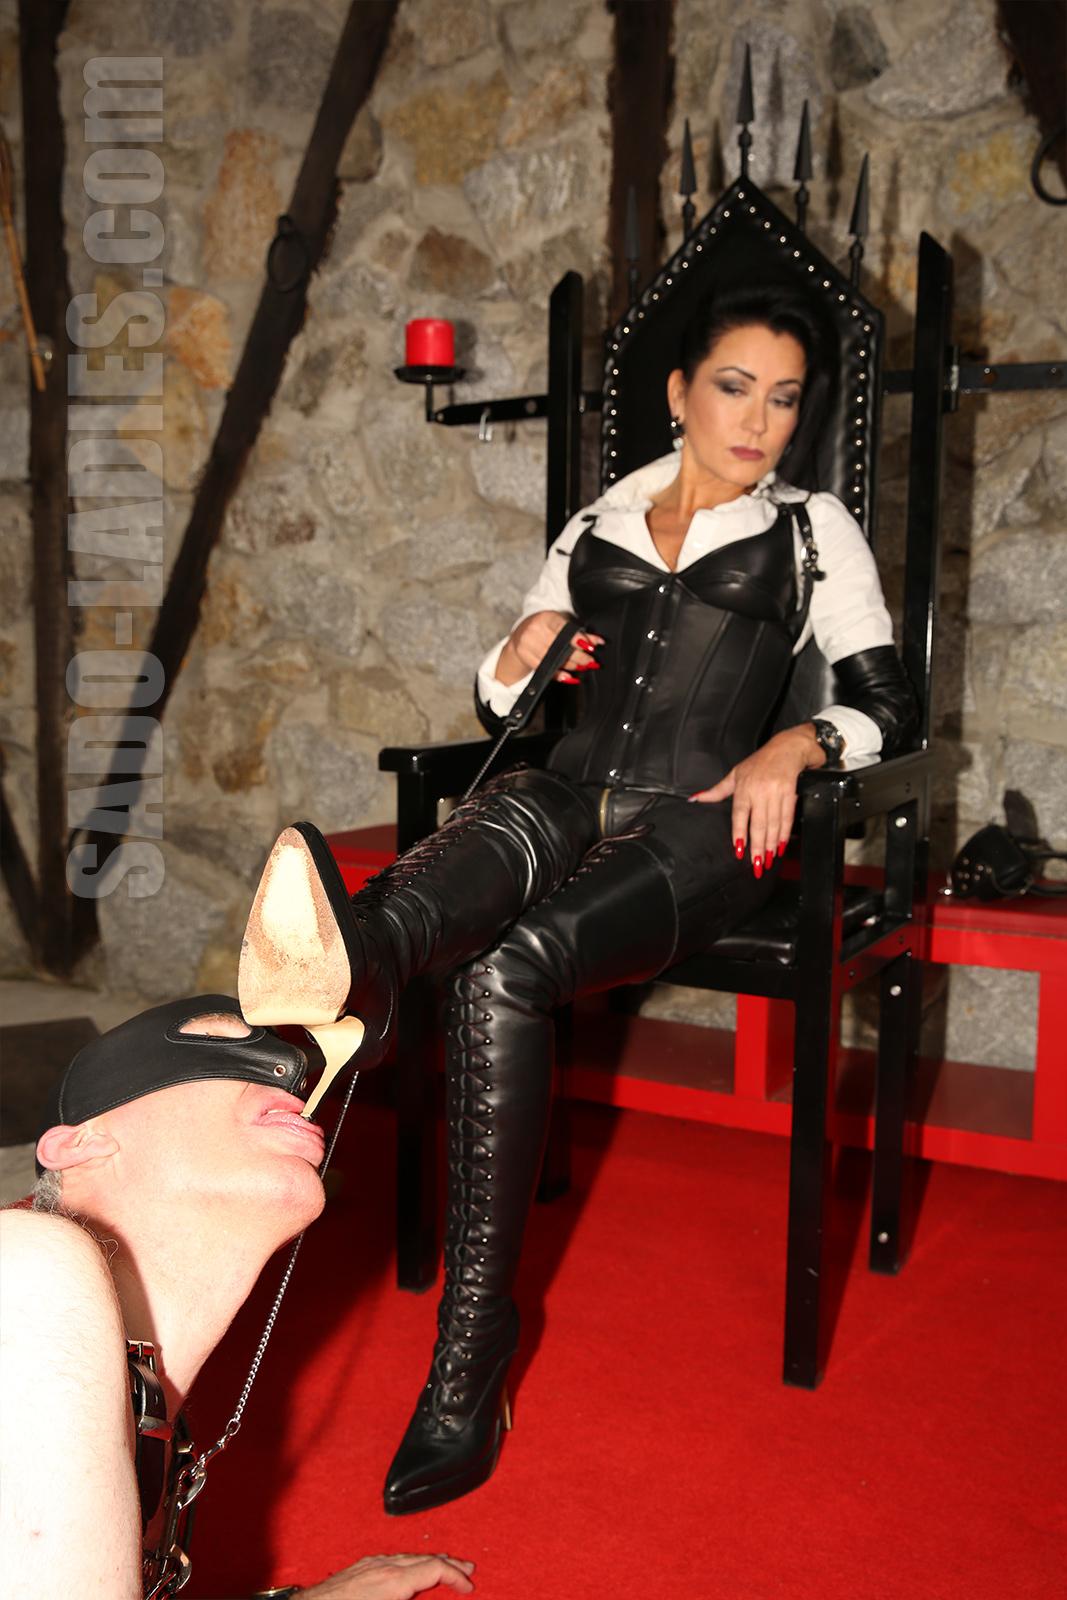 chastity mistress captions